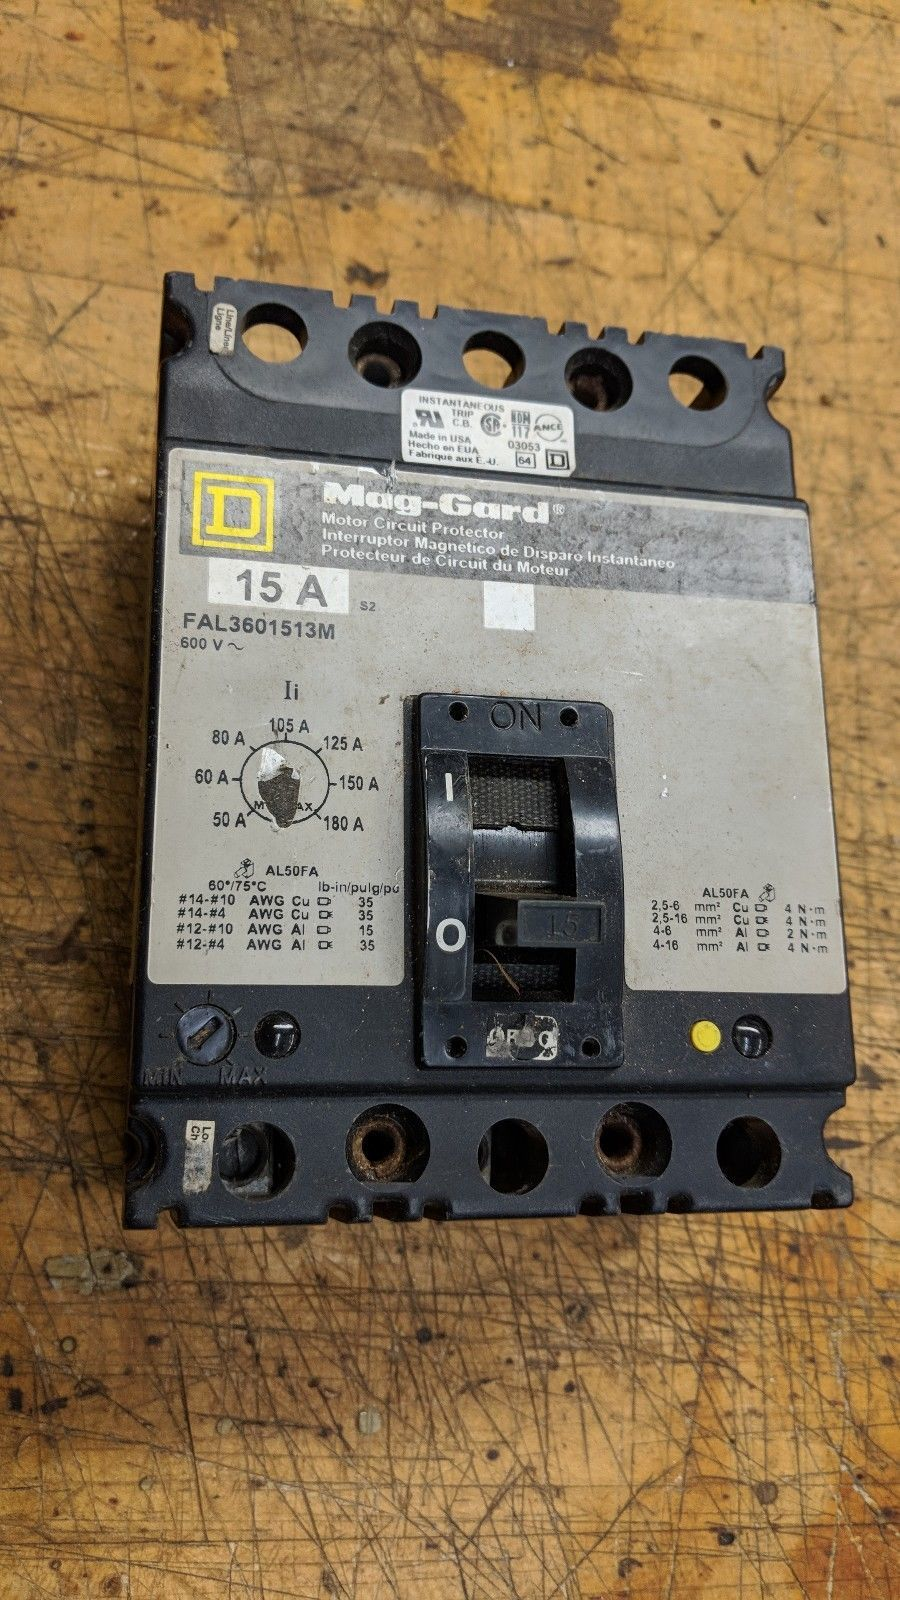 FAL3601513m Square D mag-gard Circuit Breaker 3 Pole 15 Amp 600v